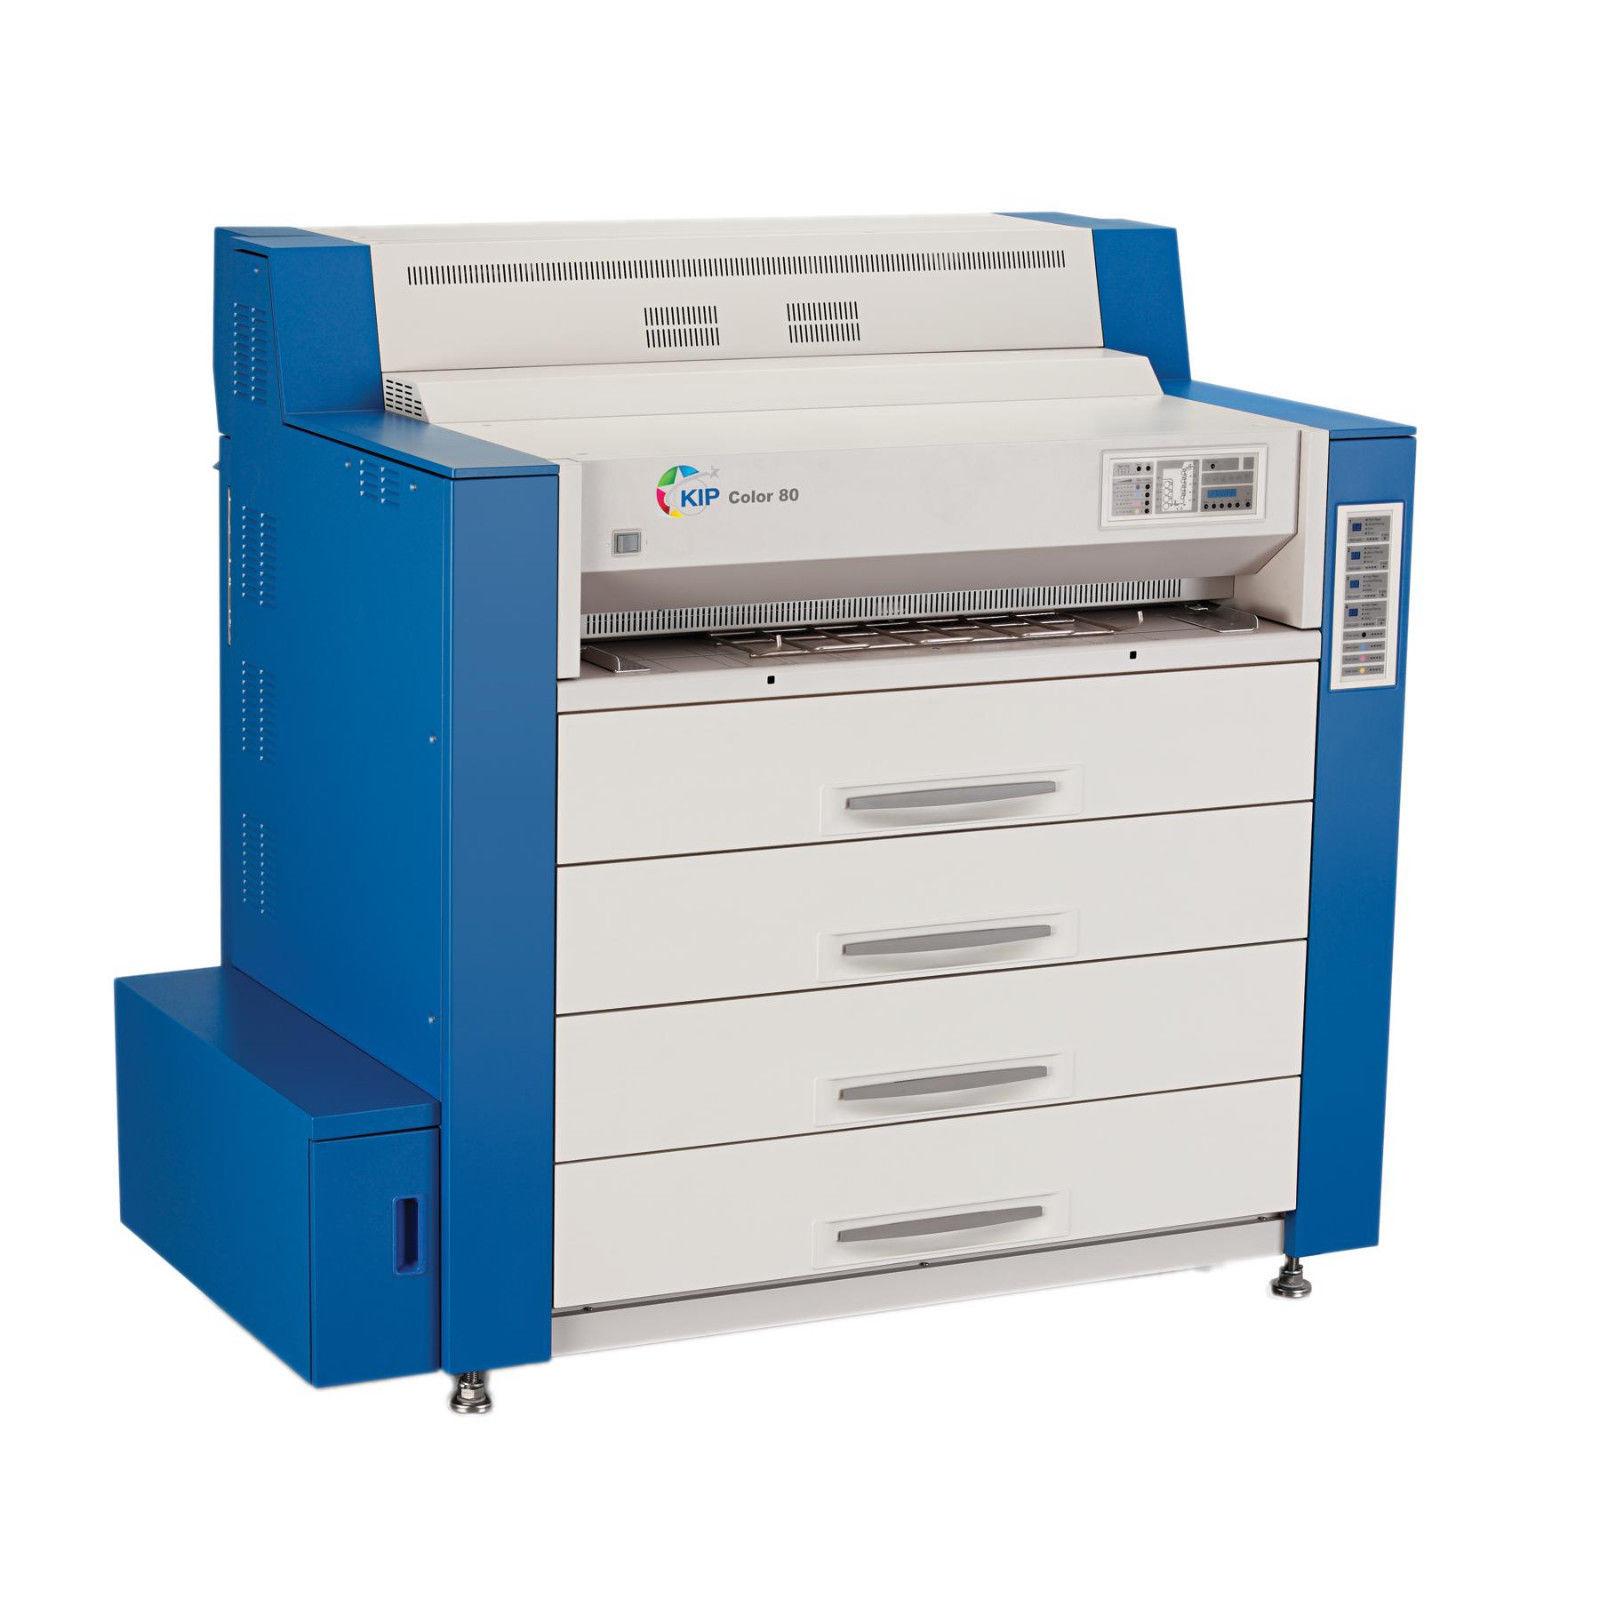 Kip Color 80 Wide Format High Speed Printer Copier PS: We buy used equipment